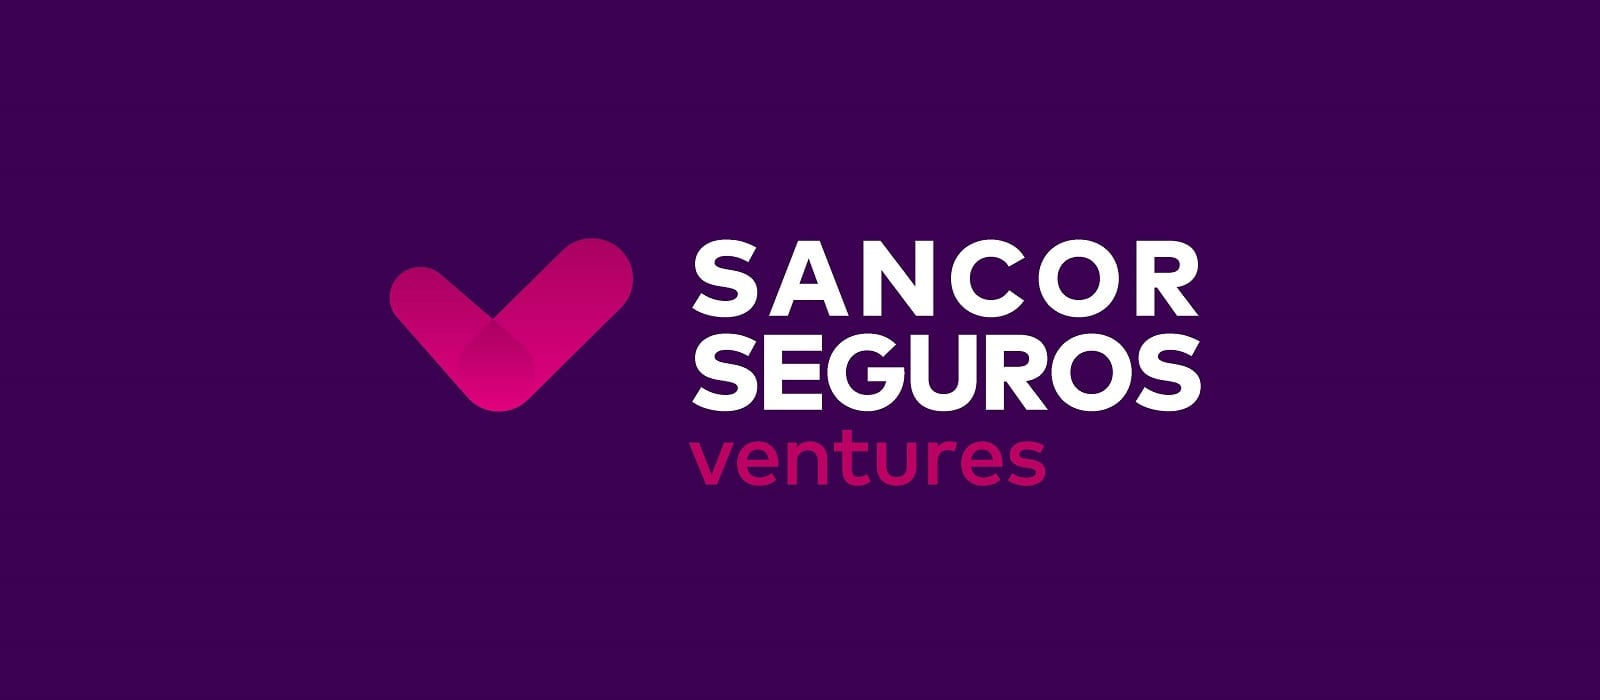 Sancor Seguros new capital venture fund